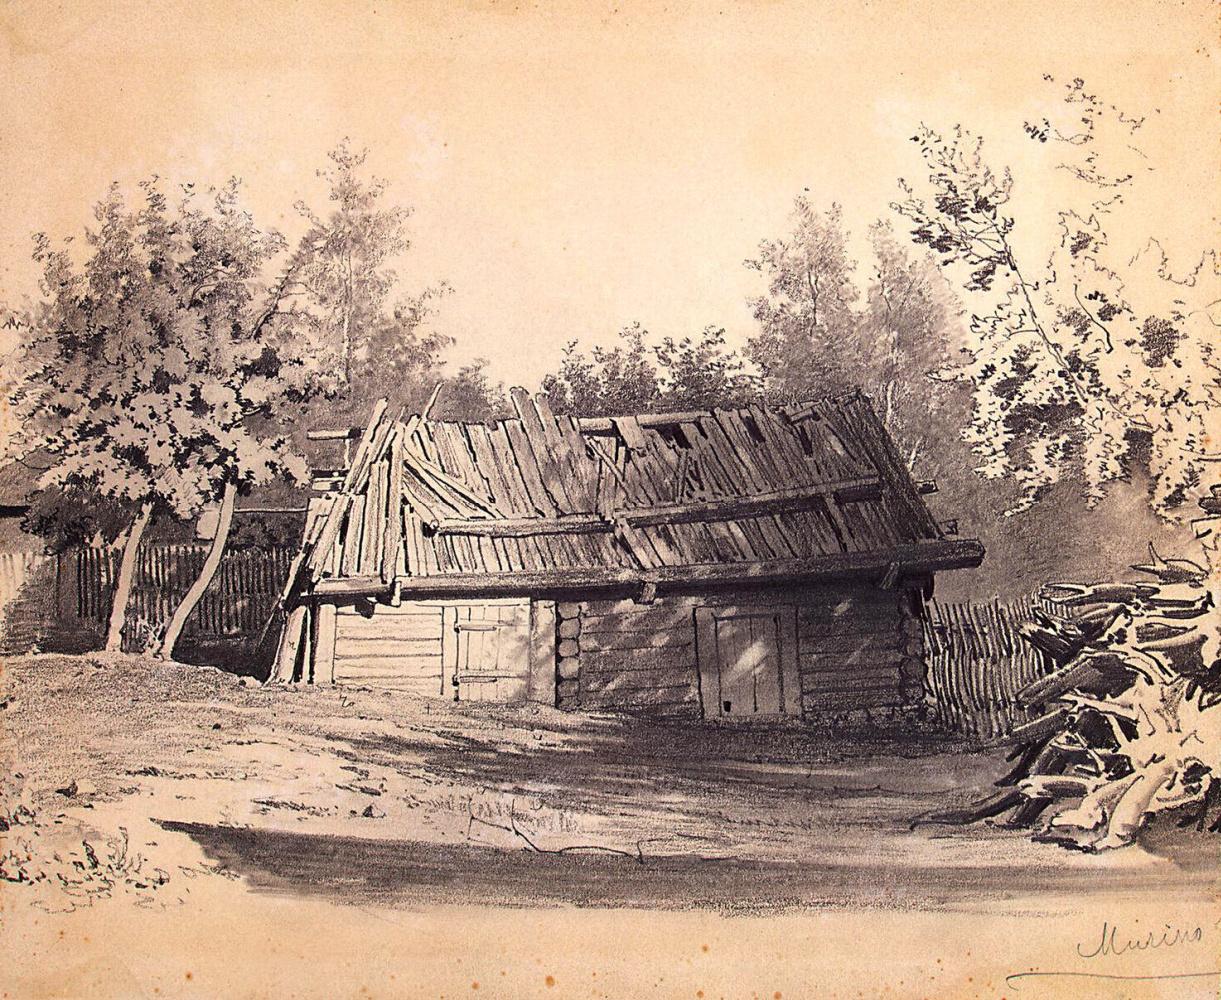 Луиджи Премацци. Полуразвалившийся сарай в саду